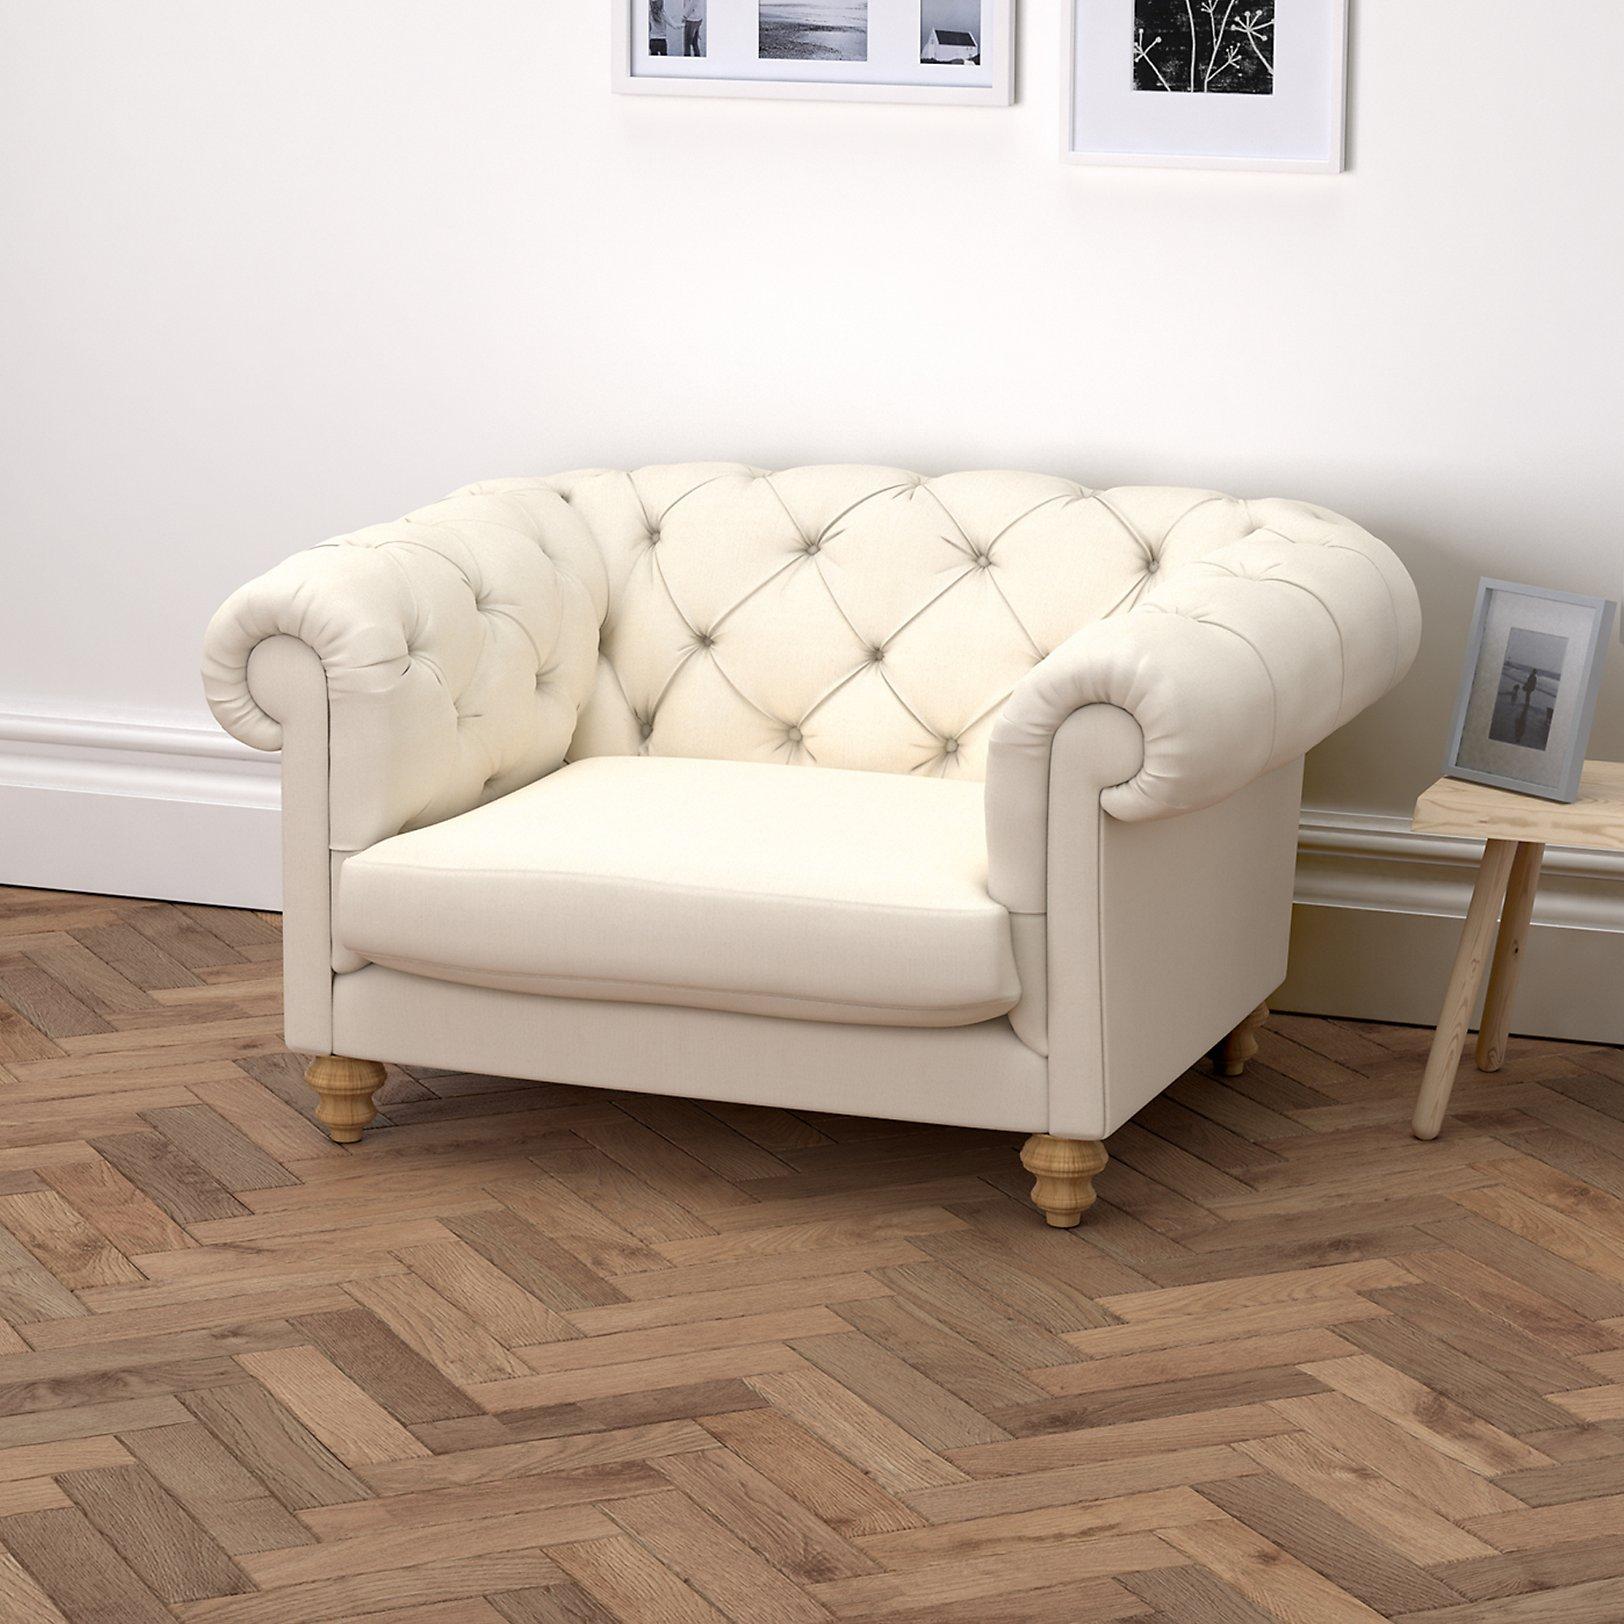 Petition Edward Luvs White Sofa: Sofa White Kompact 3 Seater Sofa Struc